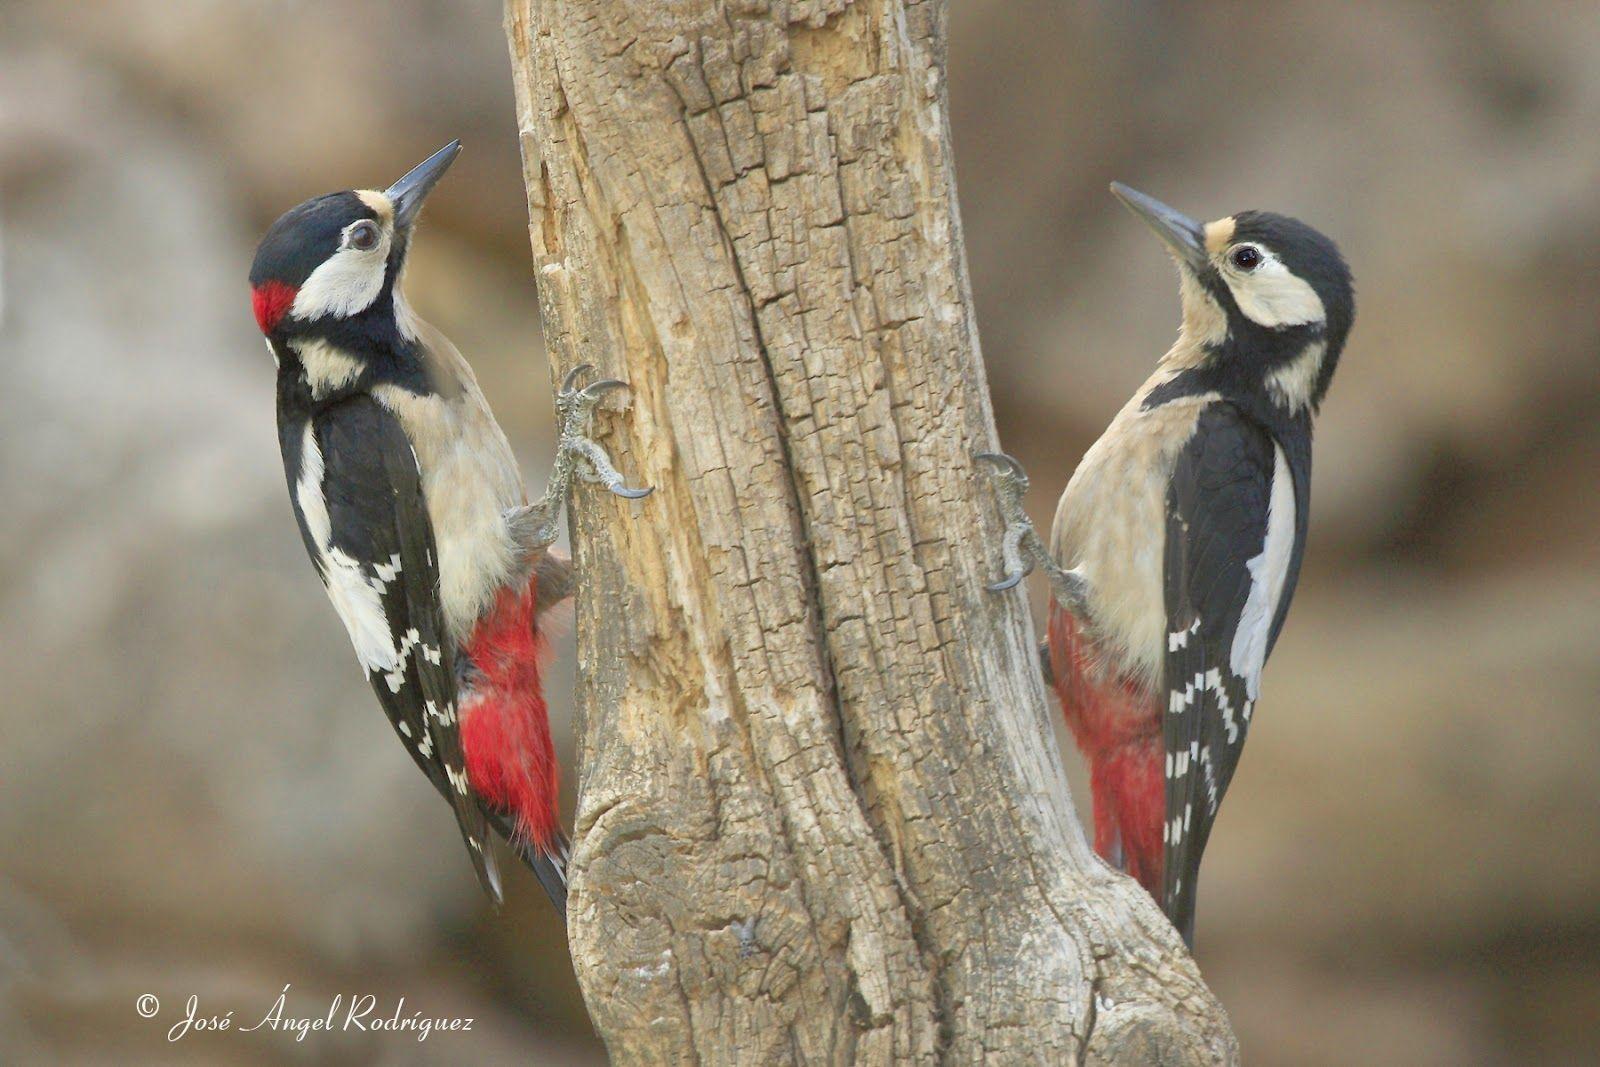 Pájaros carpinteros   SERES ESPECIALES   Pinterest   Pájaro ...